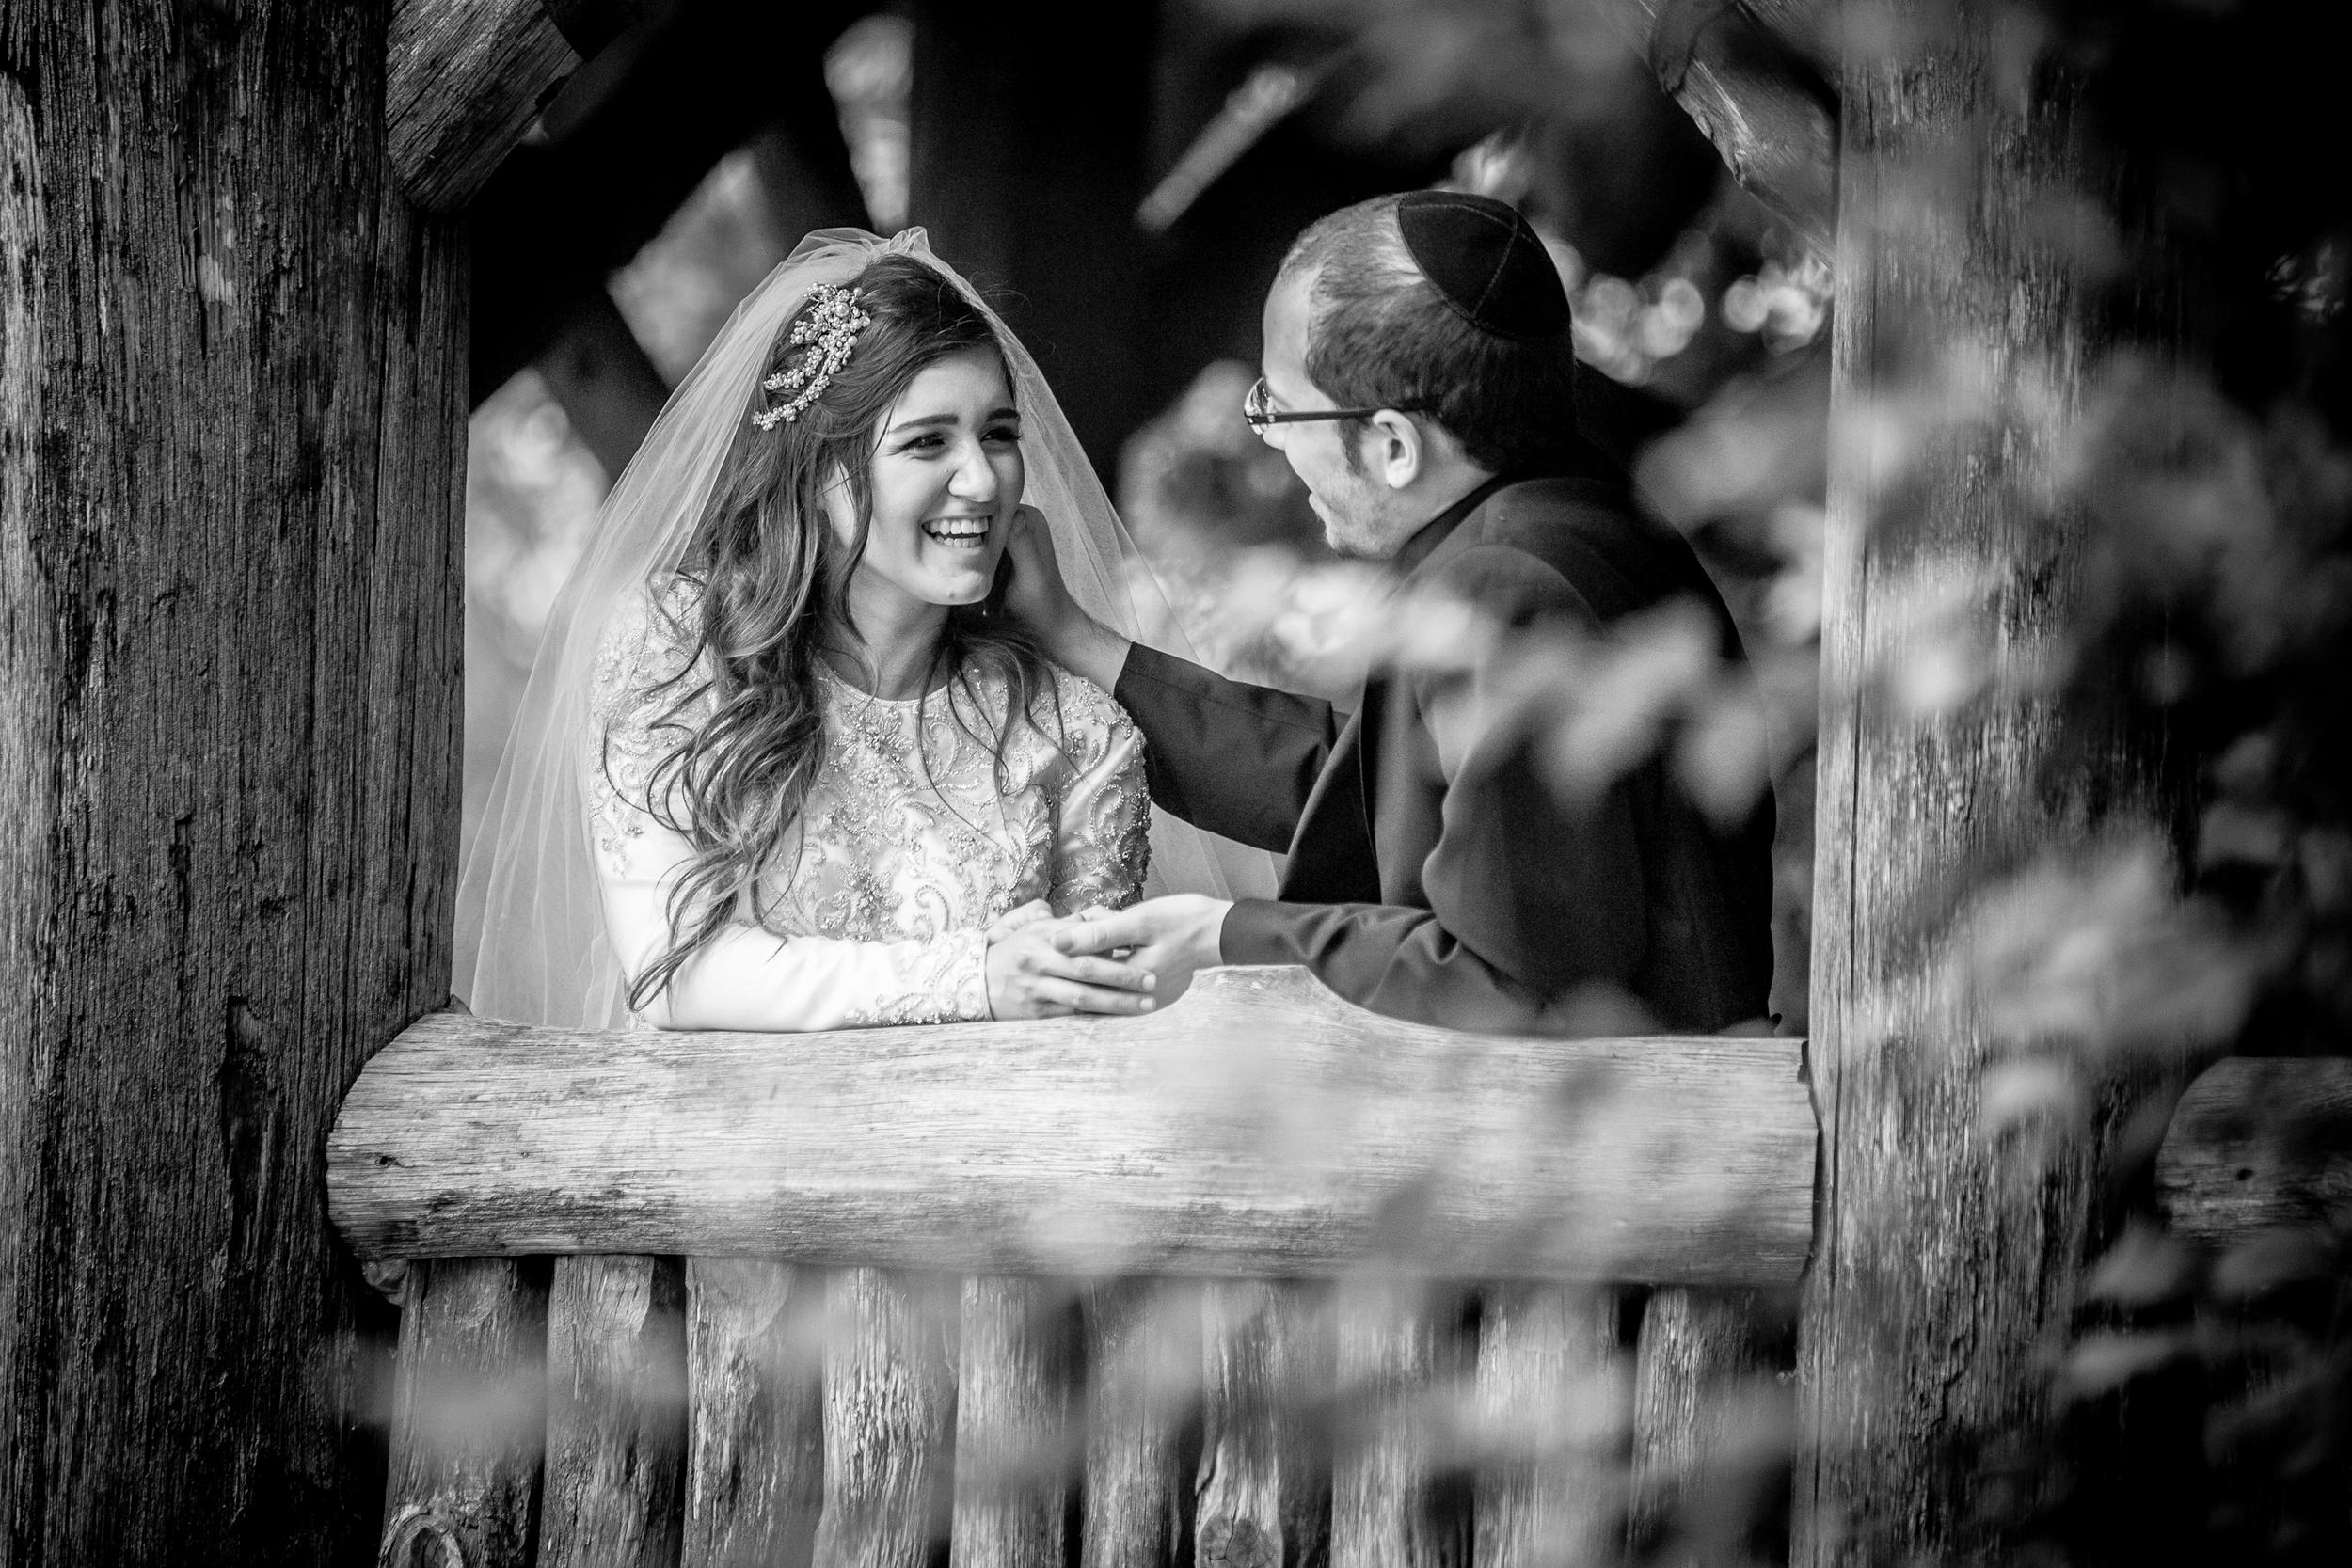 Wedding Iossi and Gitty Khafif  - Eliau Piha studio photography, new york, events, people 770 brooklyn -0657.jpg